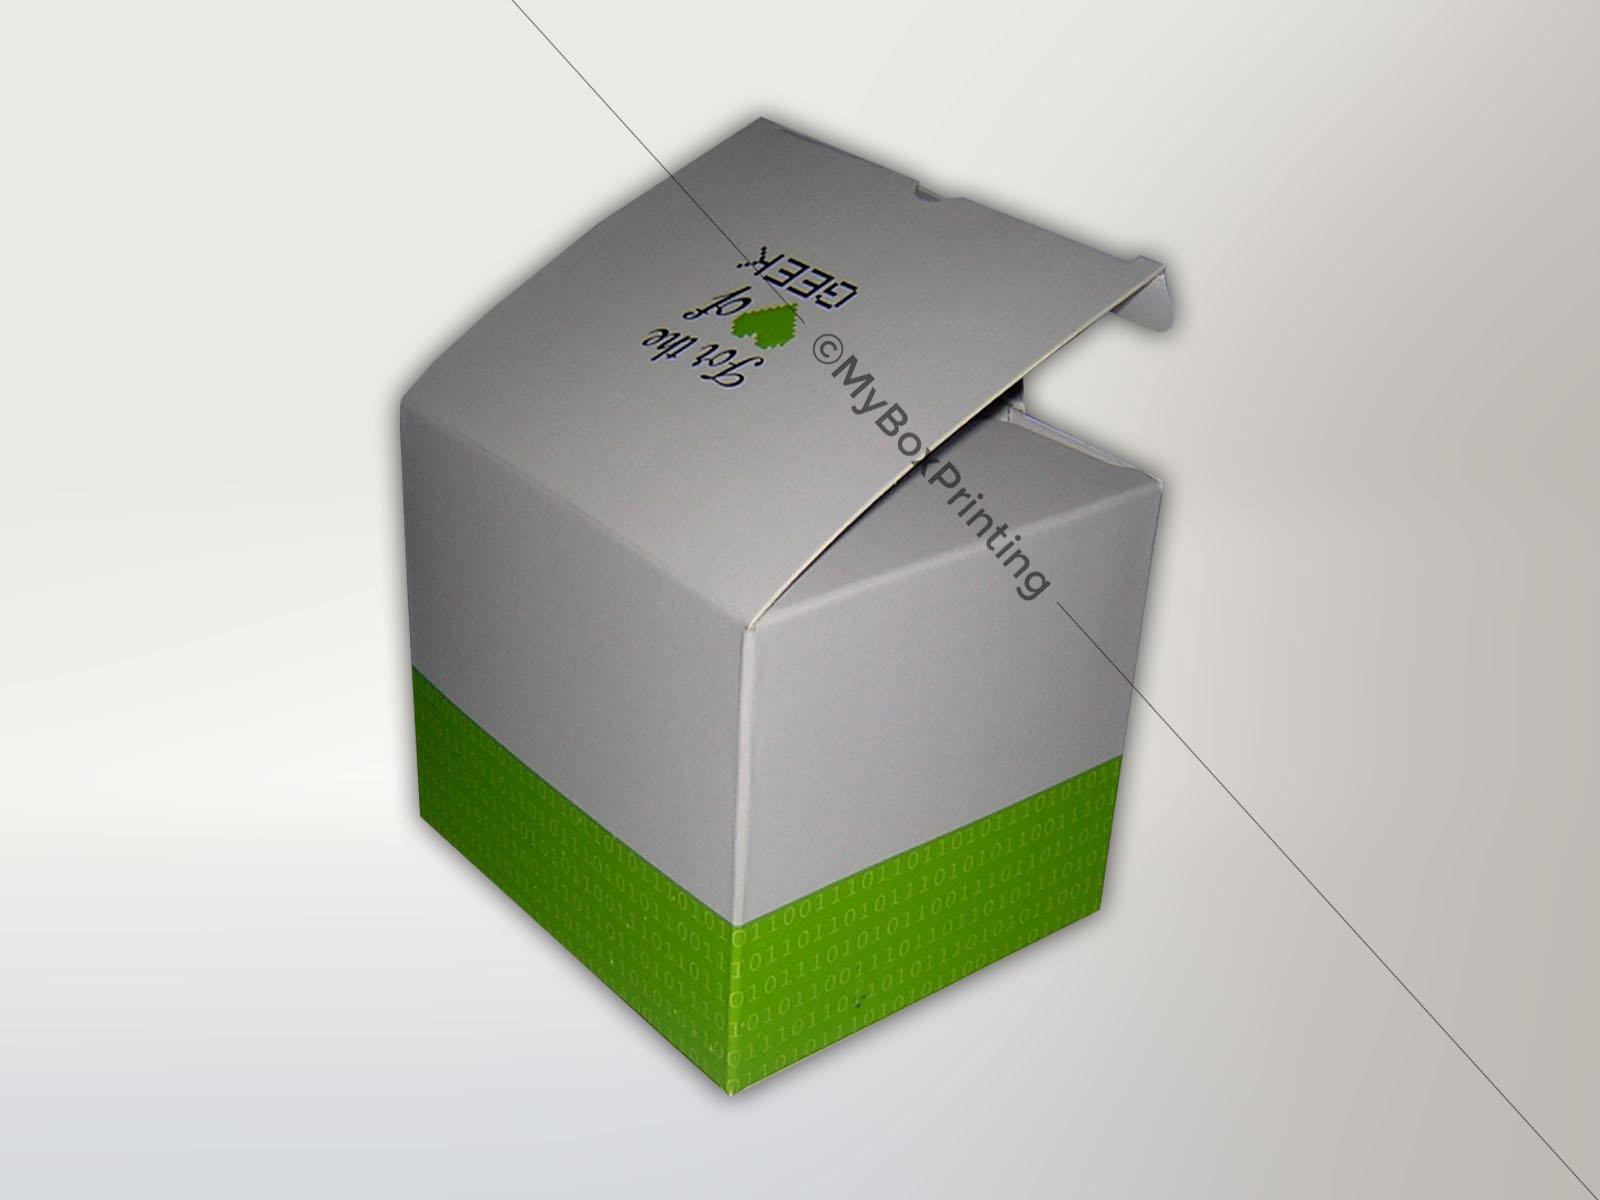 Custom Printed Mug Packaging Boxes in Australia